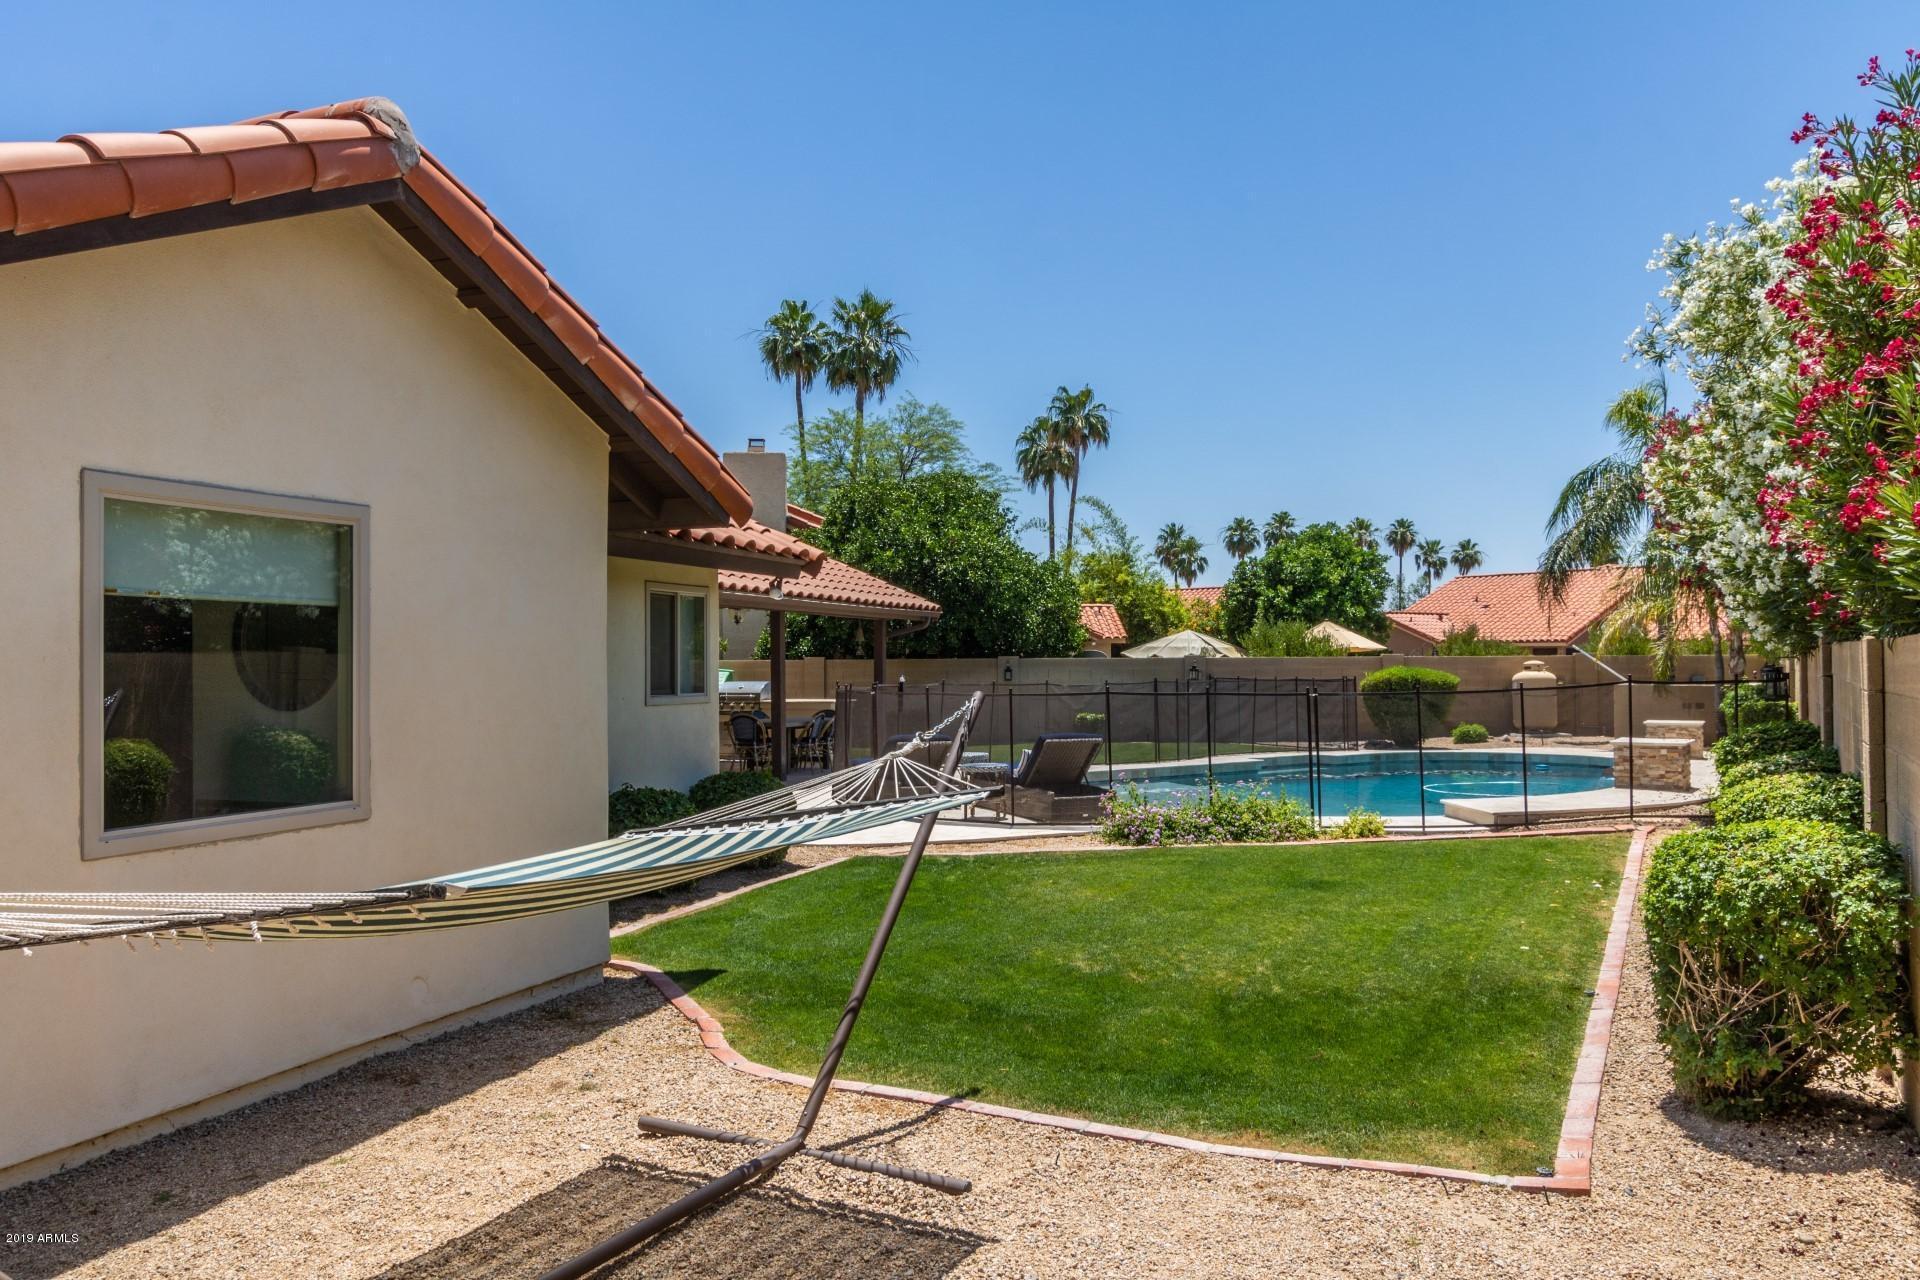 MLS 5926351 9250 N 105TH Place, Scottsdale, AZ 85258 Scottsdale AZ Scottsdale Ranch